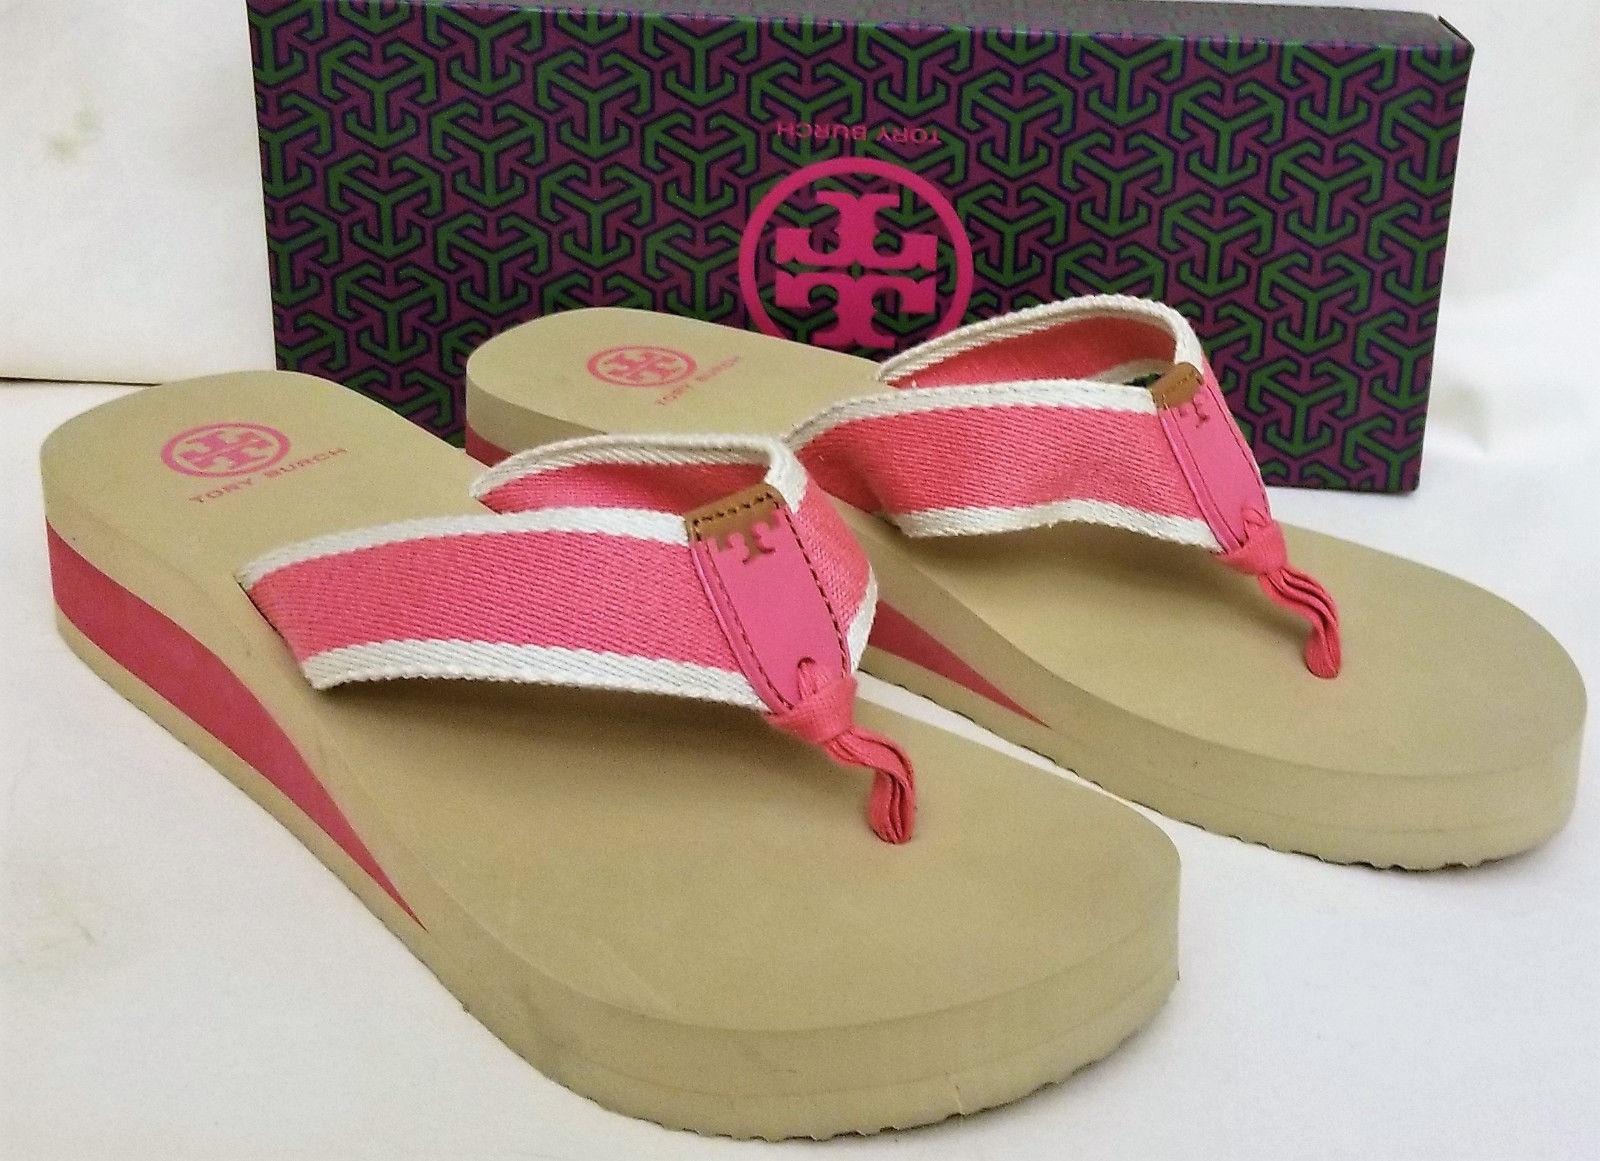 d27fc0545e8d ... top quality tori burch sandals flip flops sz10m pink fiesta ivory tory  burch accent b8287 be982